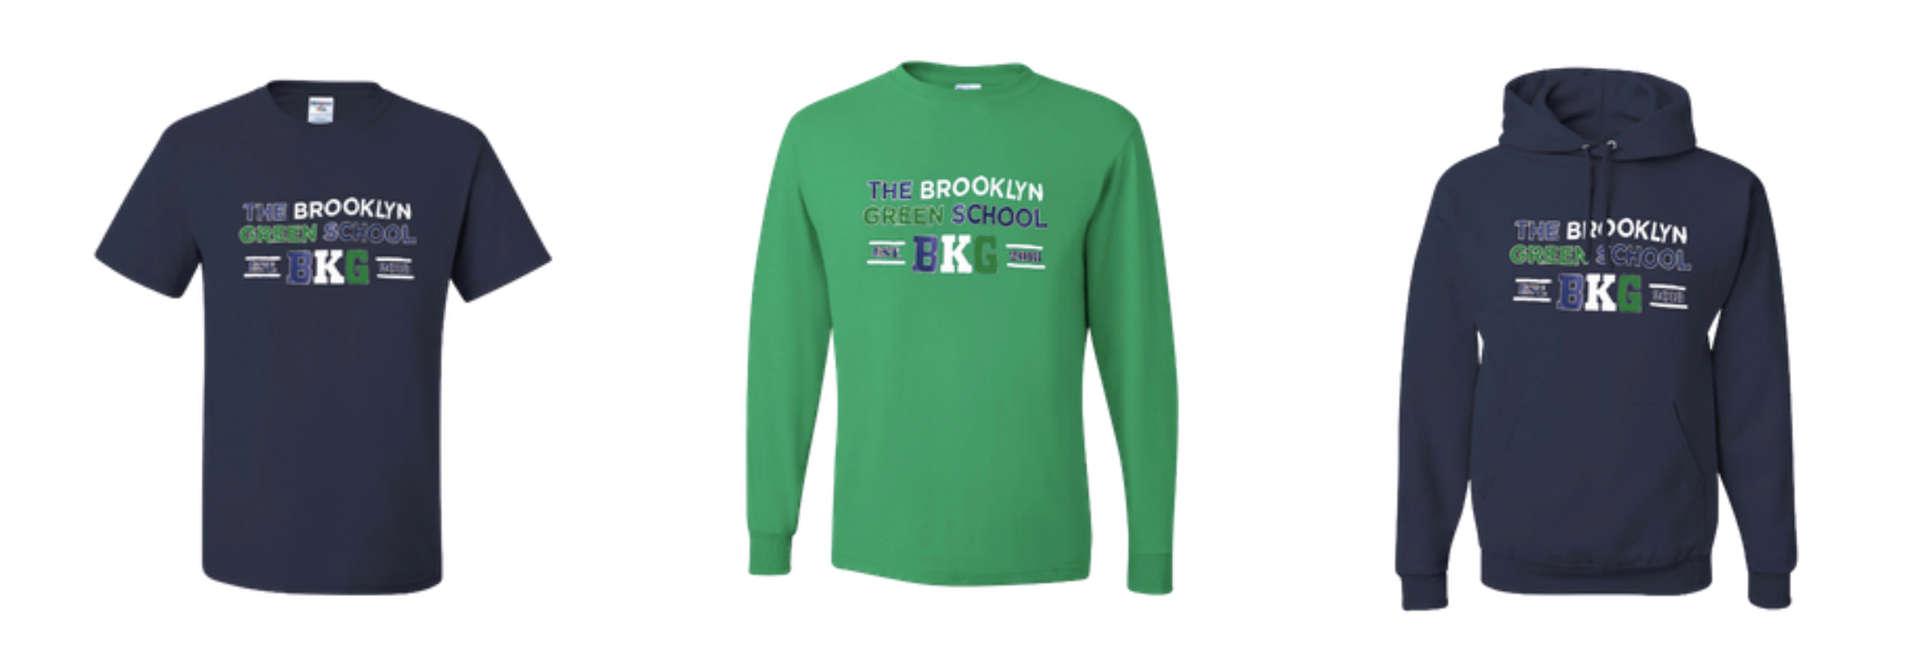 BGK apparel: a t-shirt, long tee, and hoodie